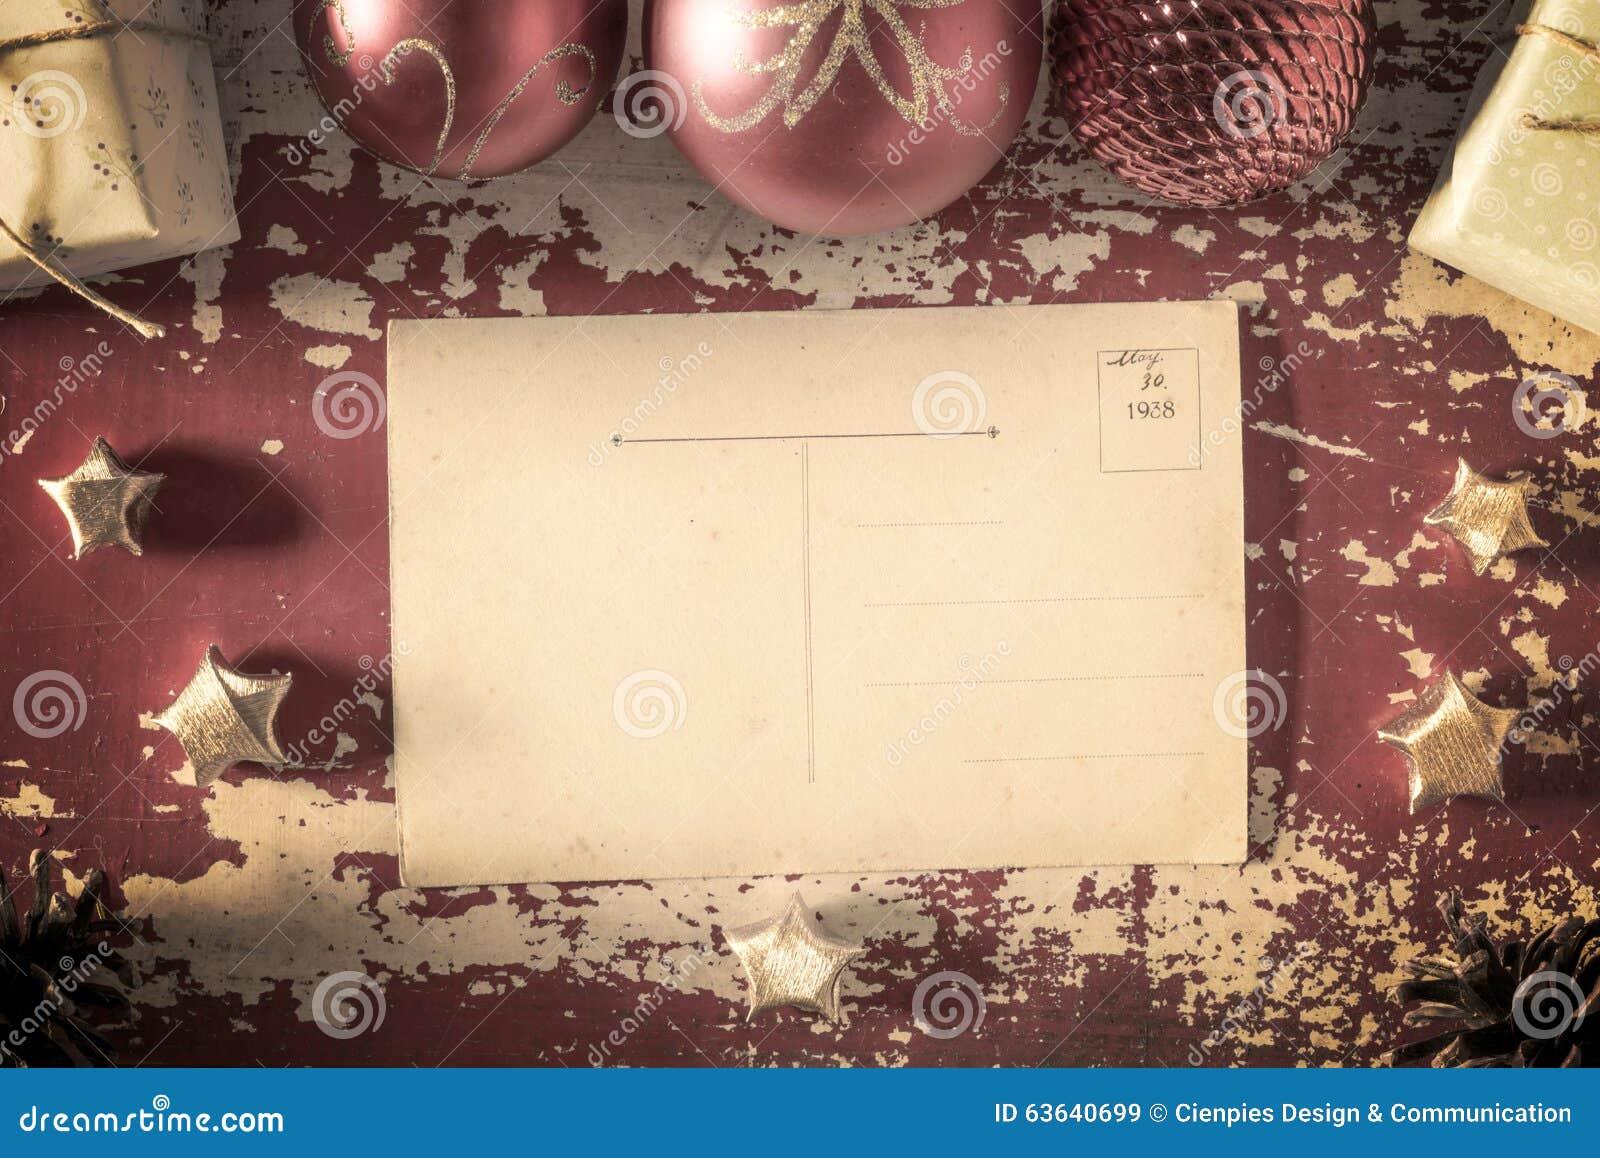 Retro Merry Christmas Vintage Greeting Card Stock Image Image Of